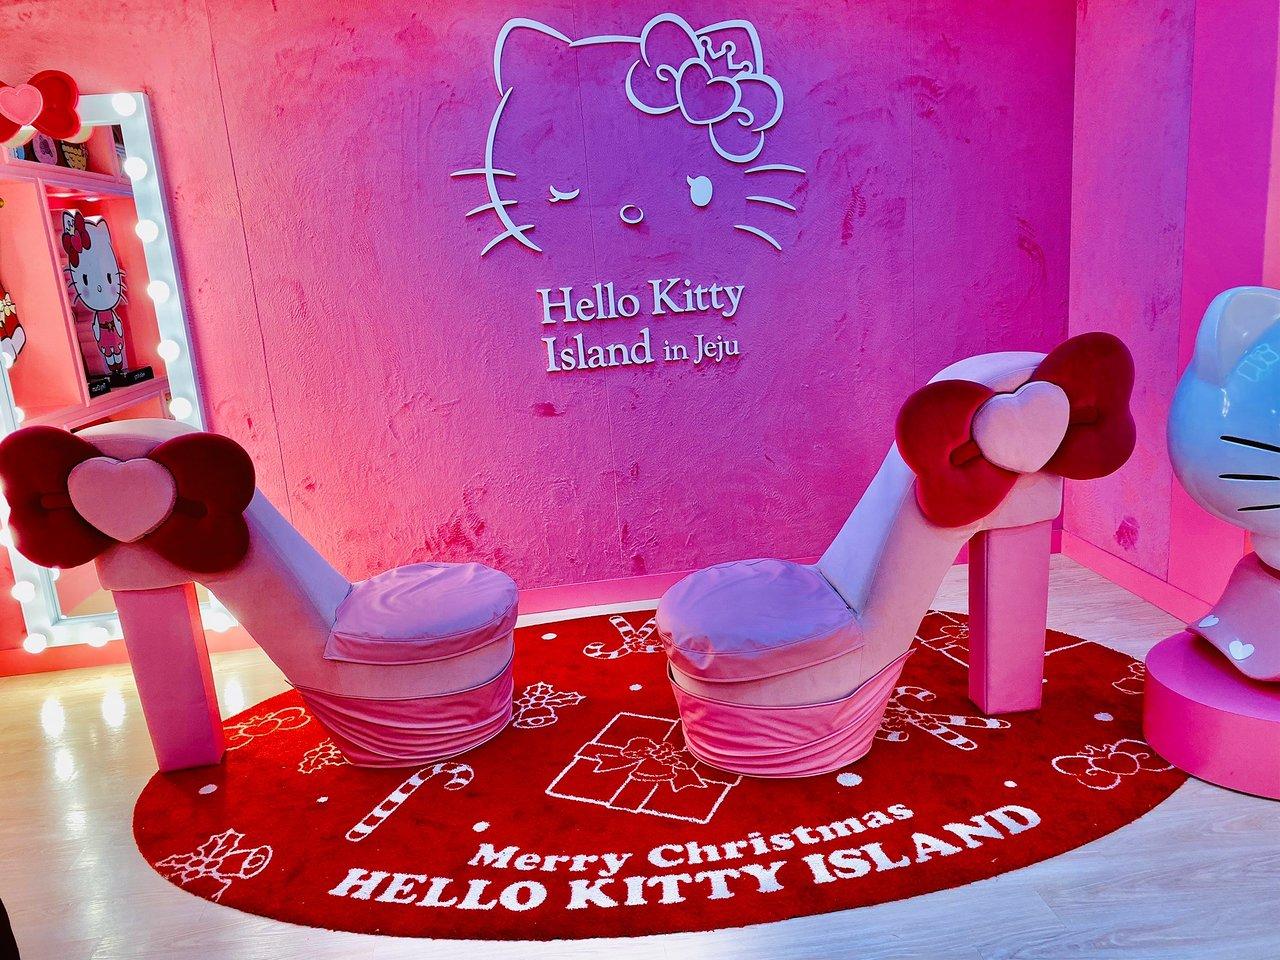 Hello Kitty Island Jeju 2020 All You Need To Know Before You Go With Photos Tripadvisor